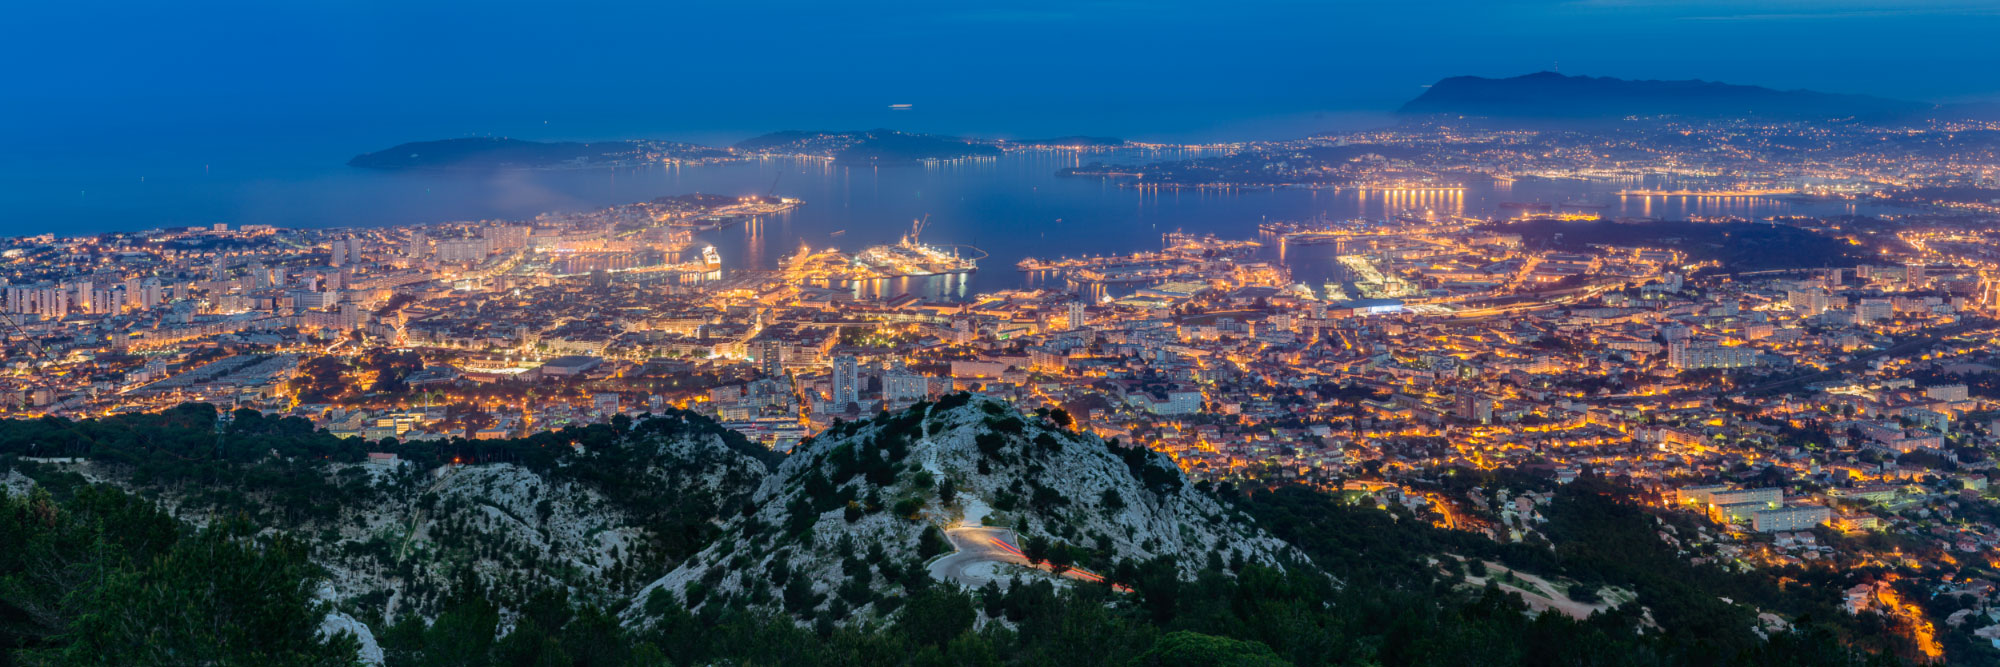 Rade de Toulon, Méditerranée